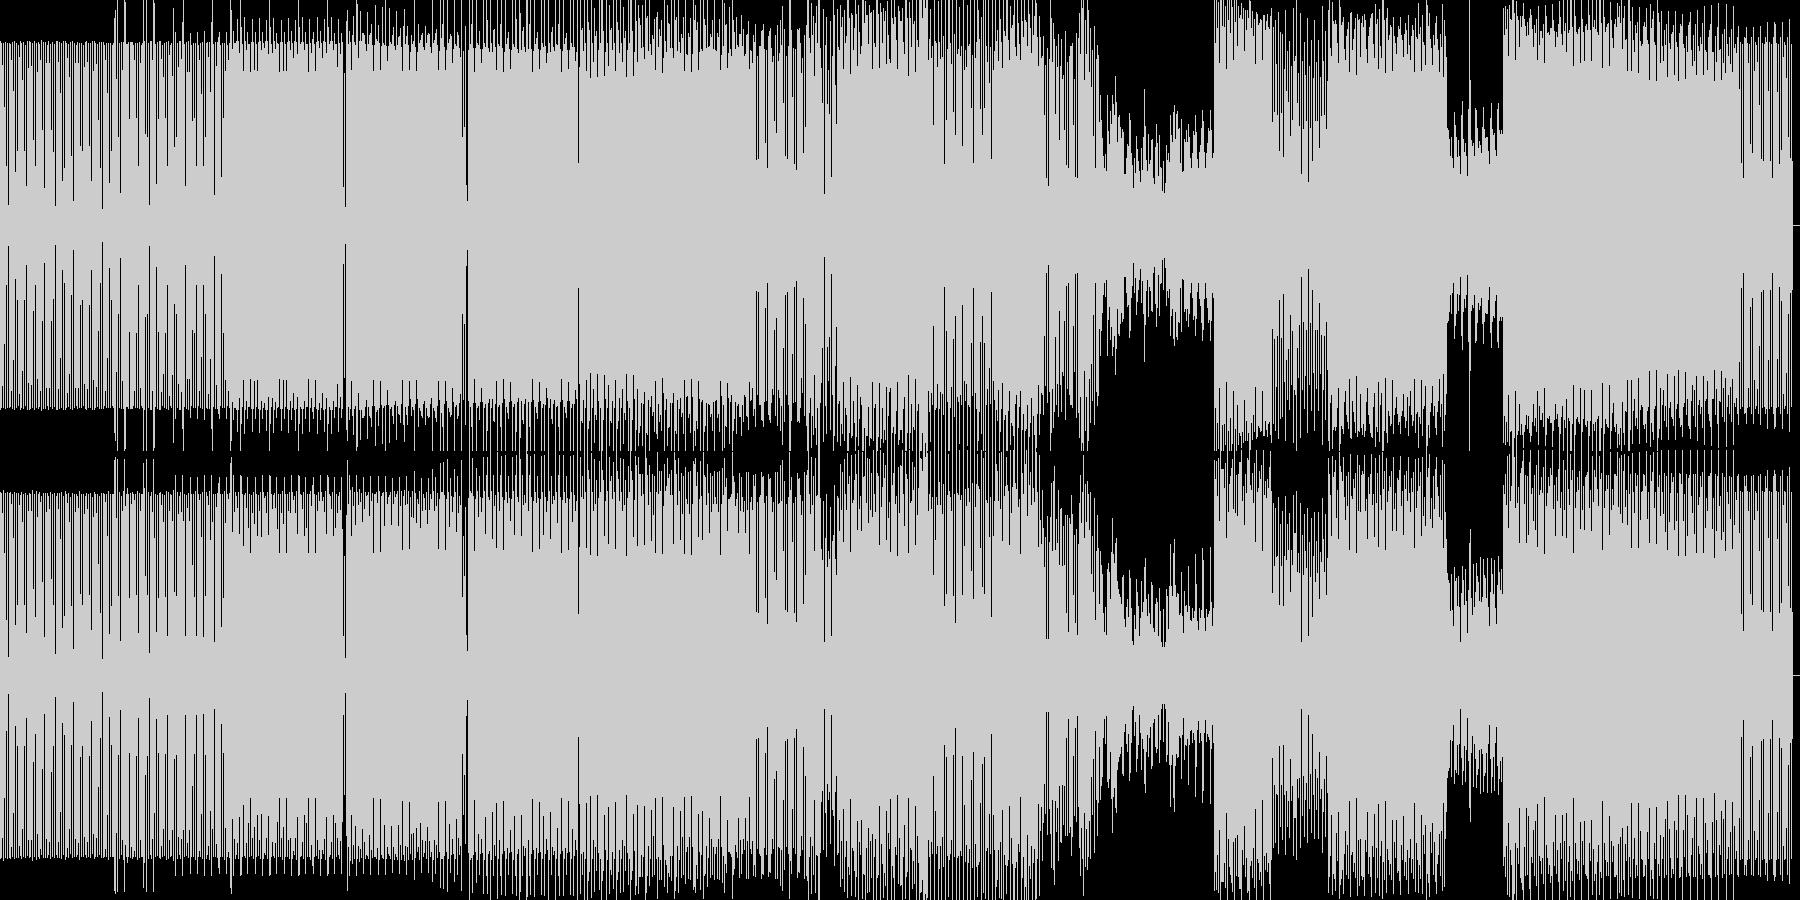 minimal house の未再生の波形